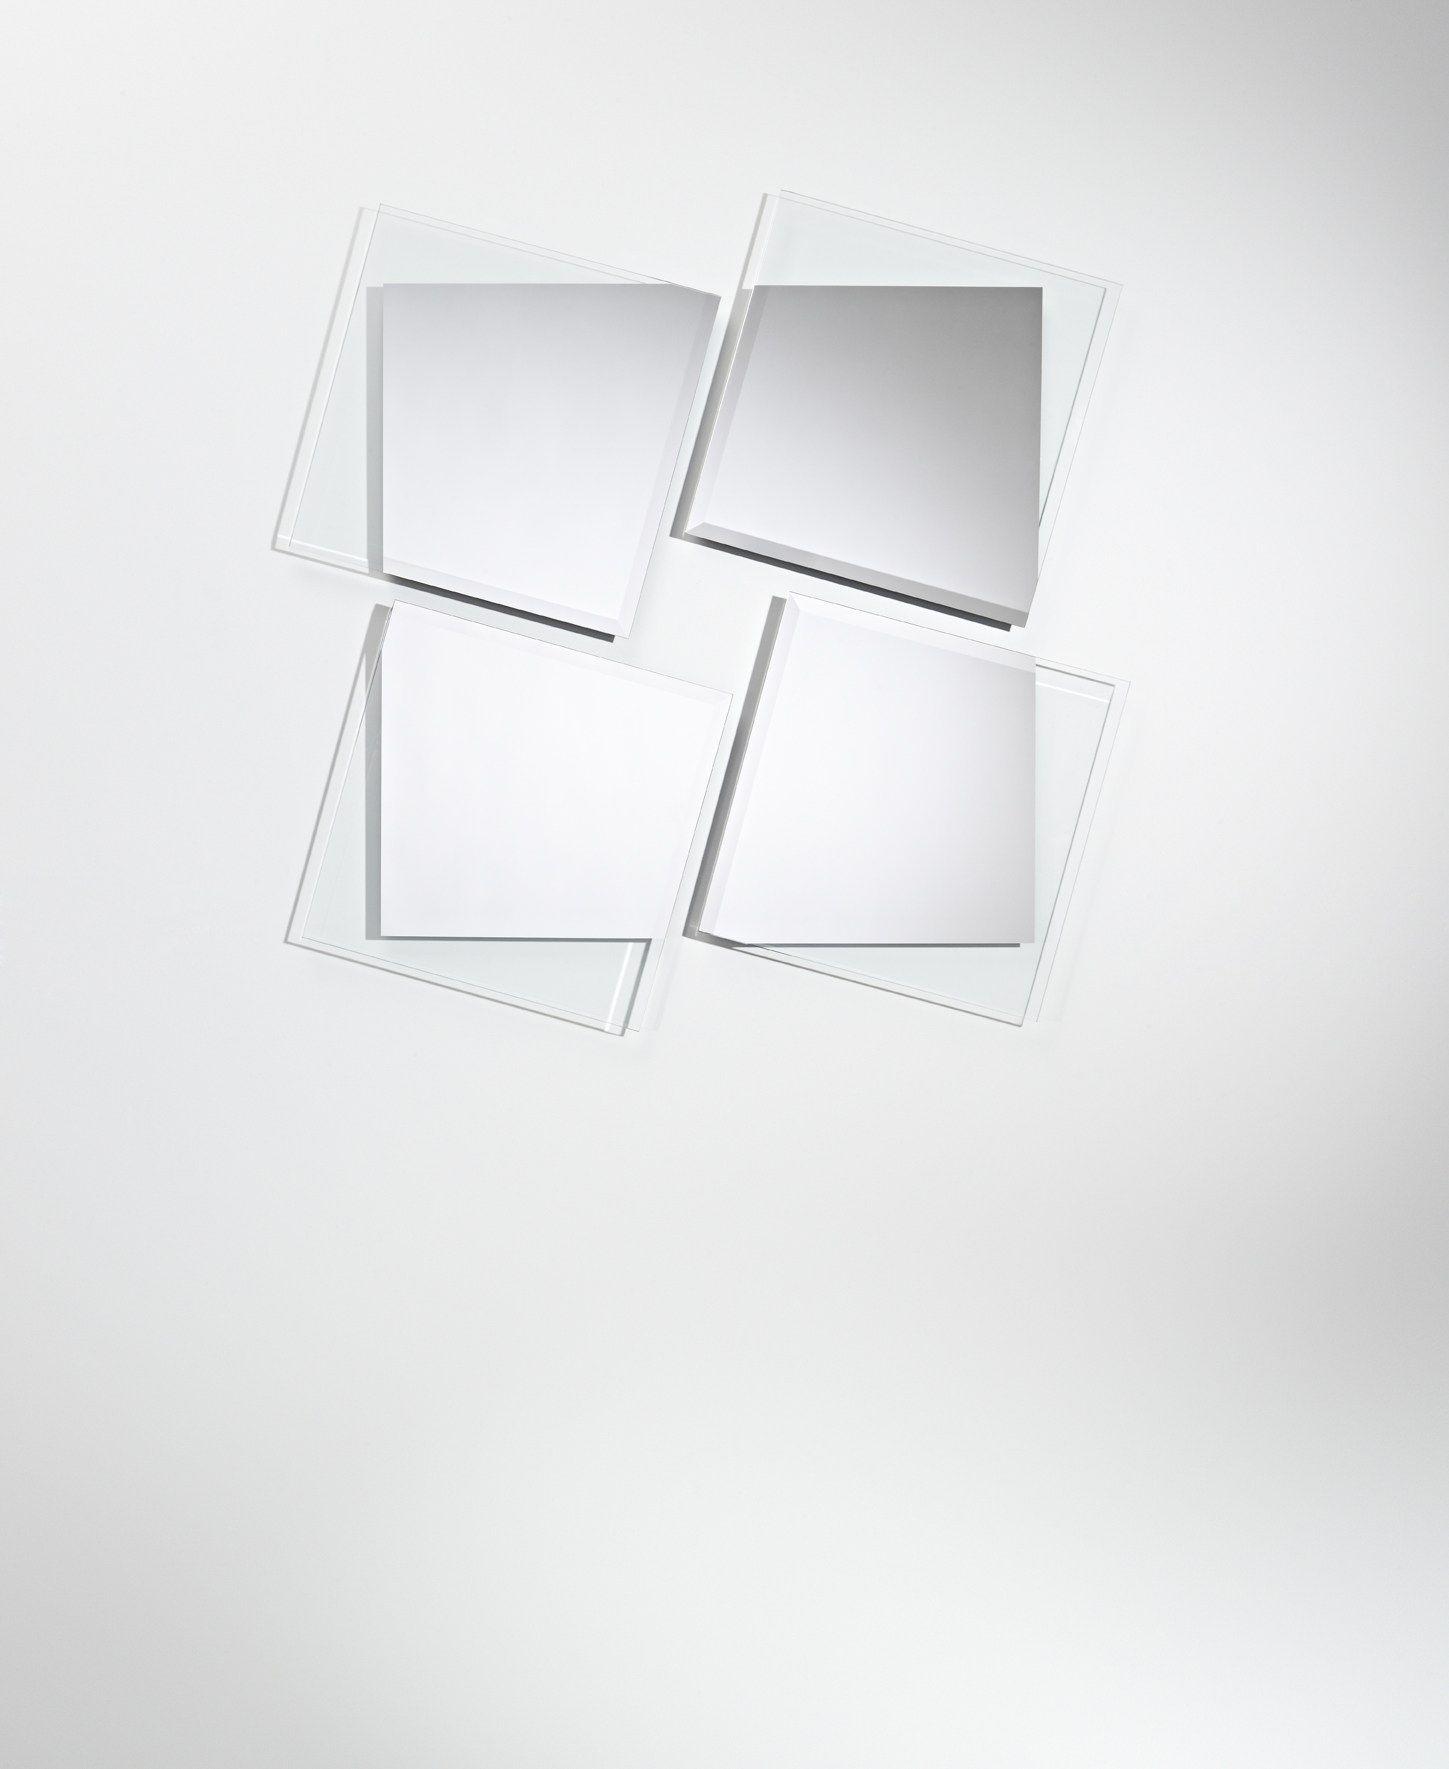 Miroir rectangulaire mural de style contemporain eclat for Miroir eclat